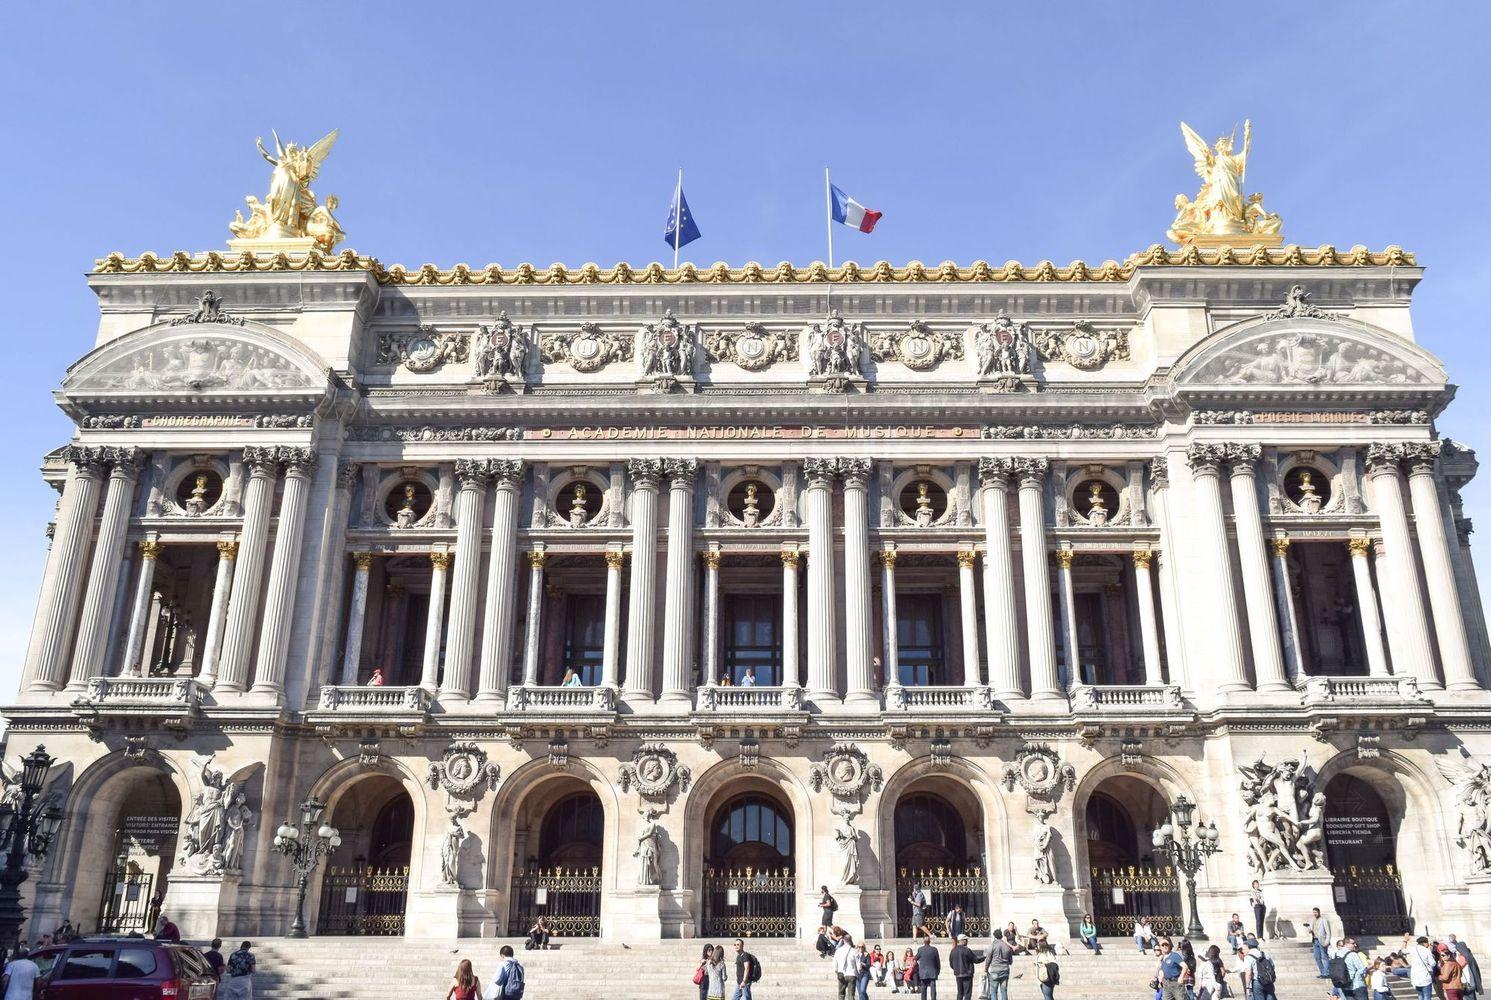 Palais Garnier Paris Façade